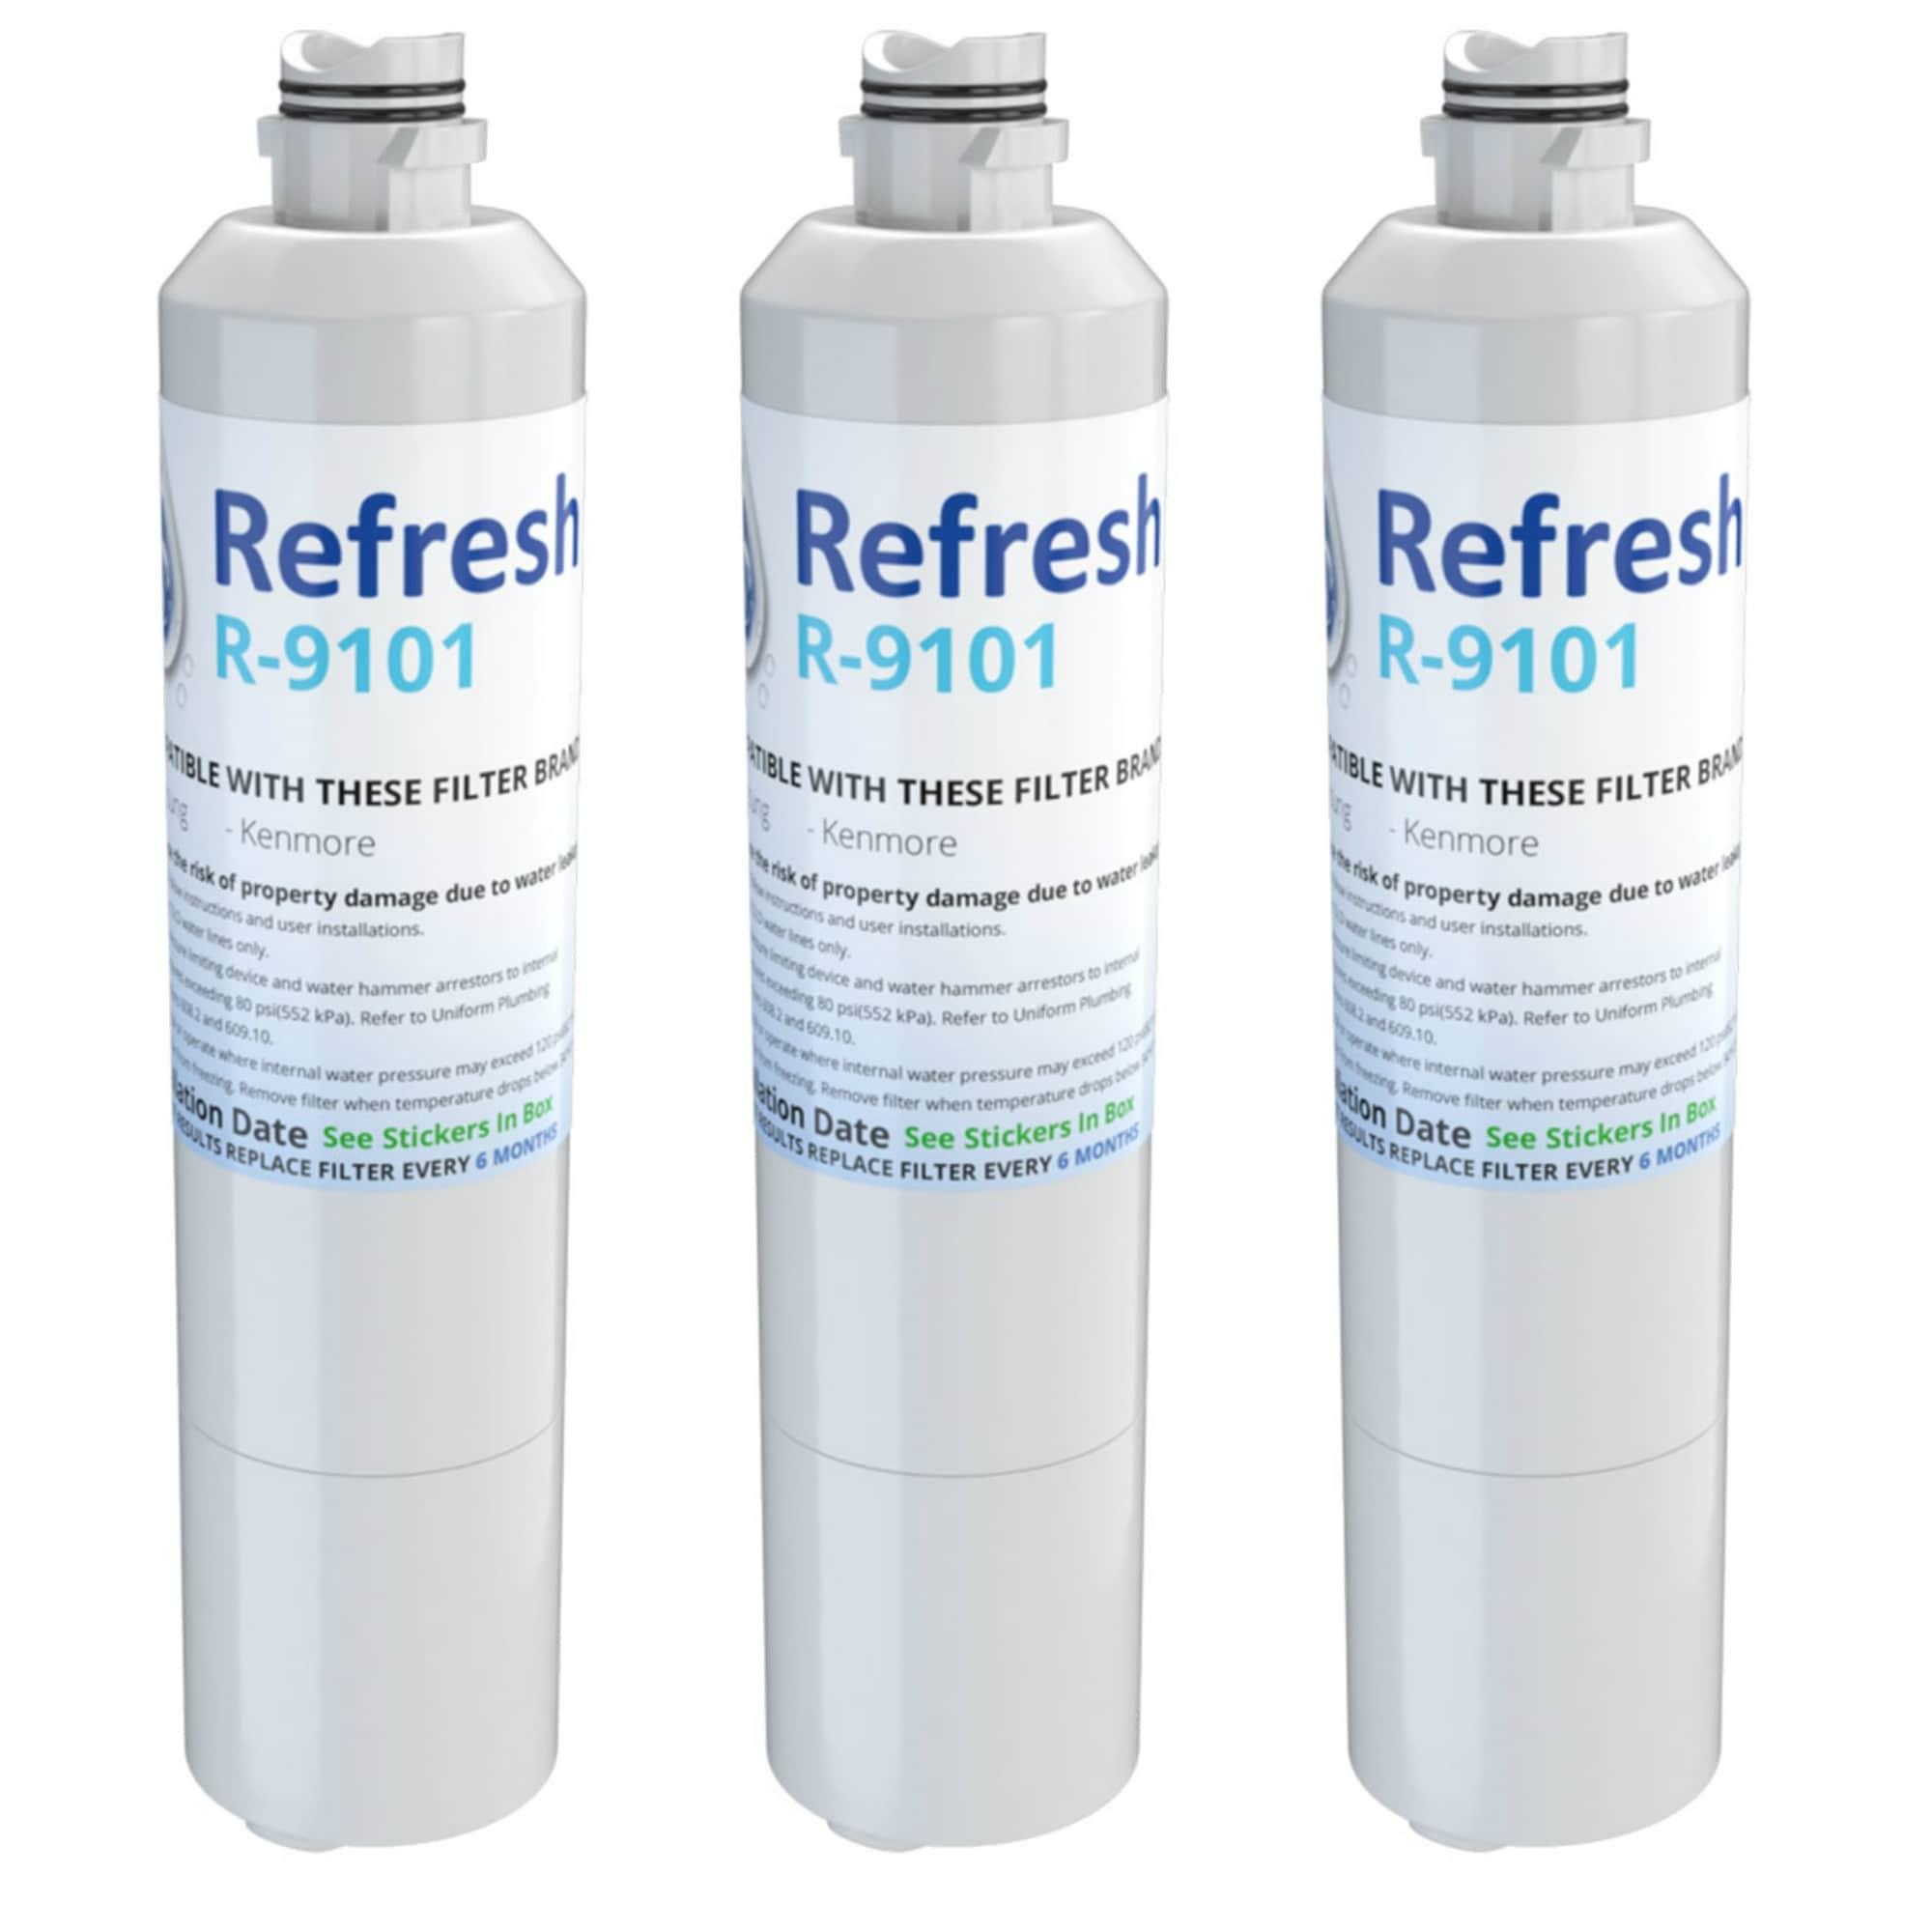 AquaFresh Replacement Water Filter for Samsung RF23J9011SR//AA Refrigerators 3Pk